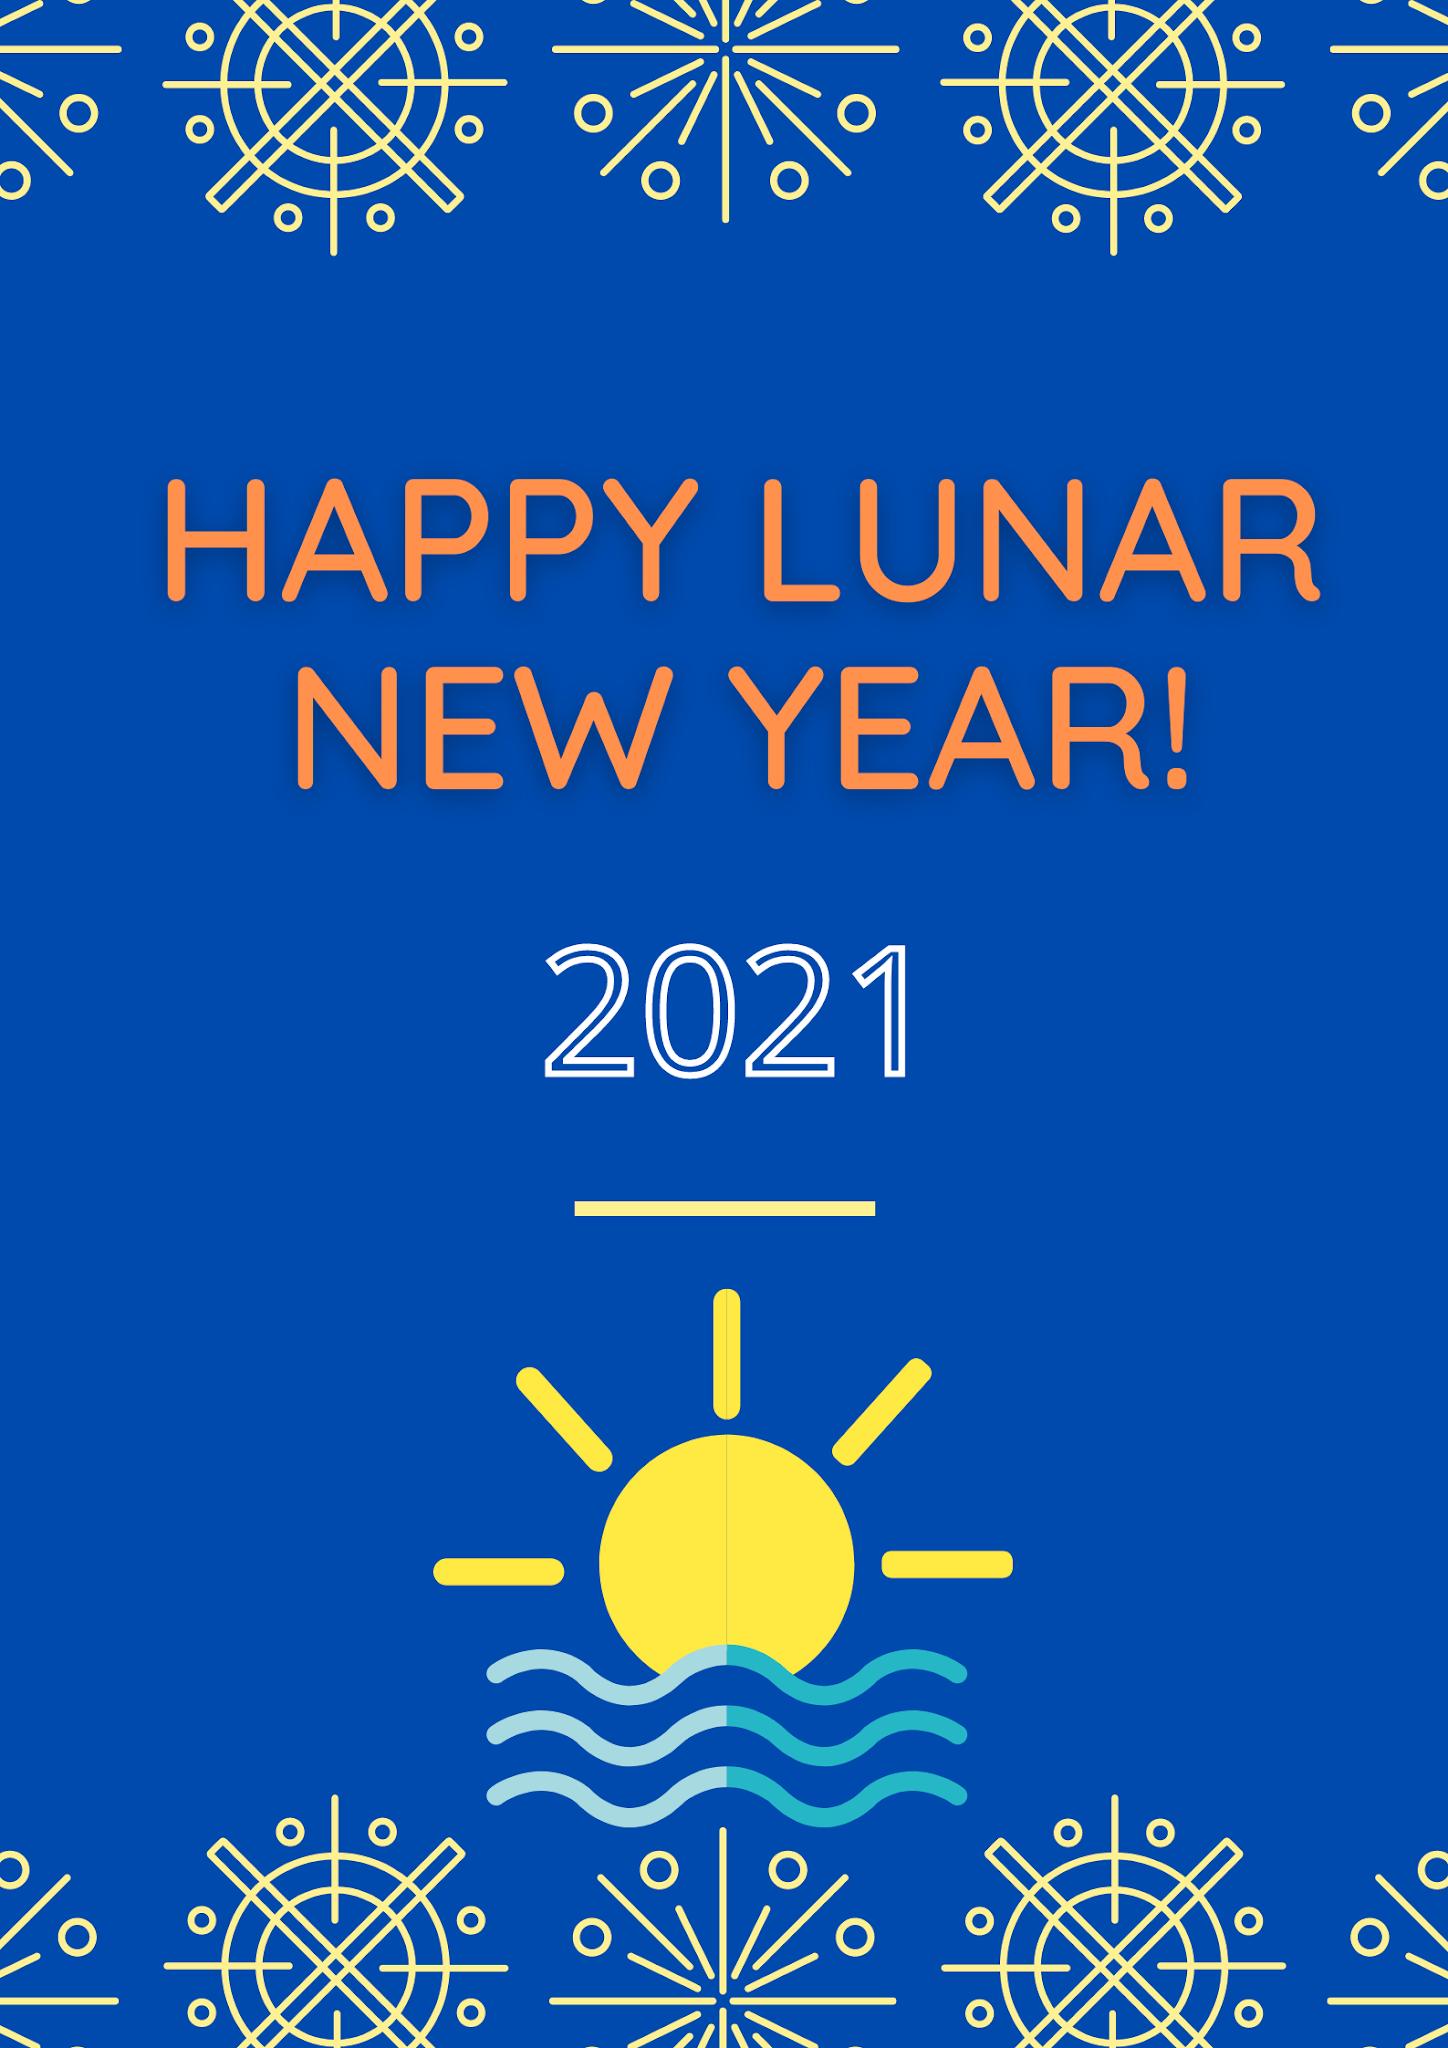 Happy New Year 2021 Best Image